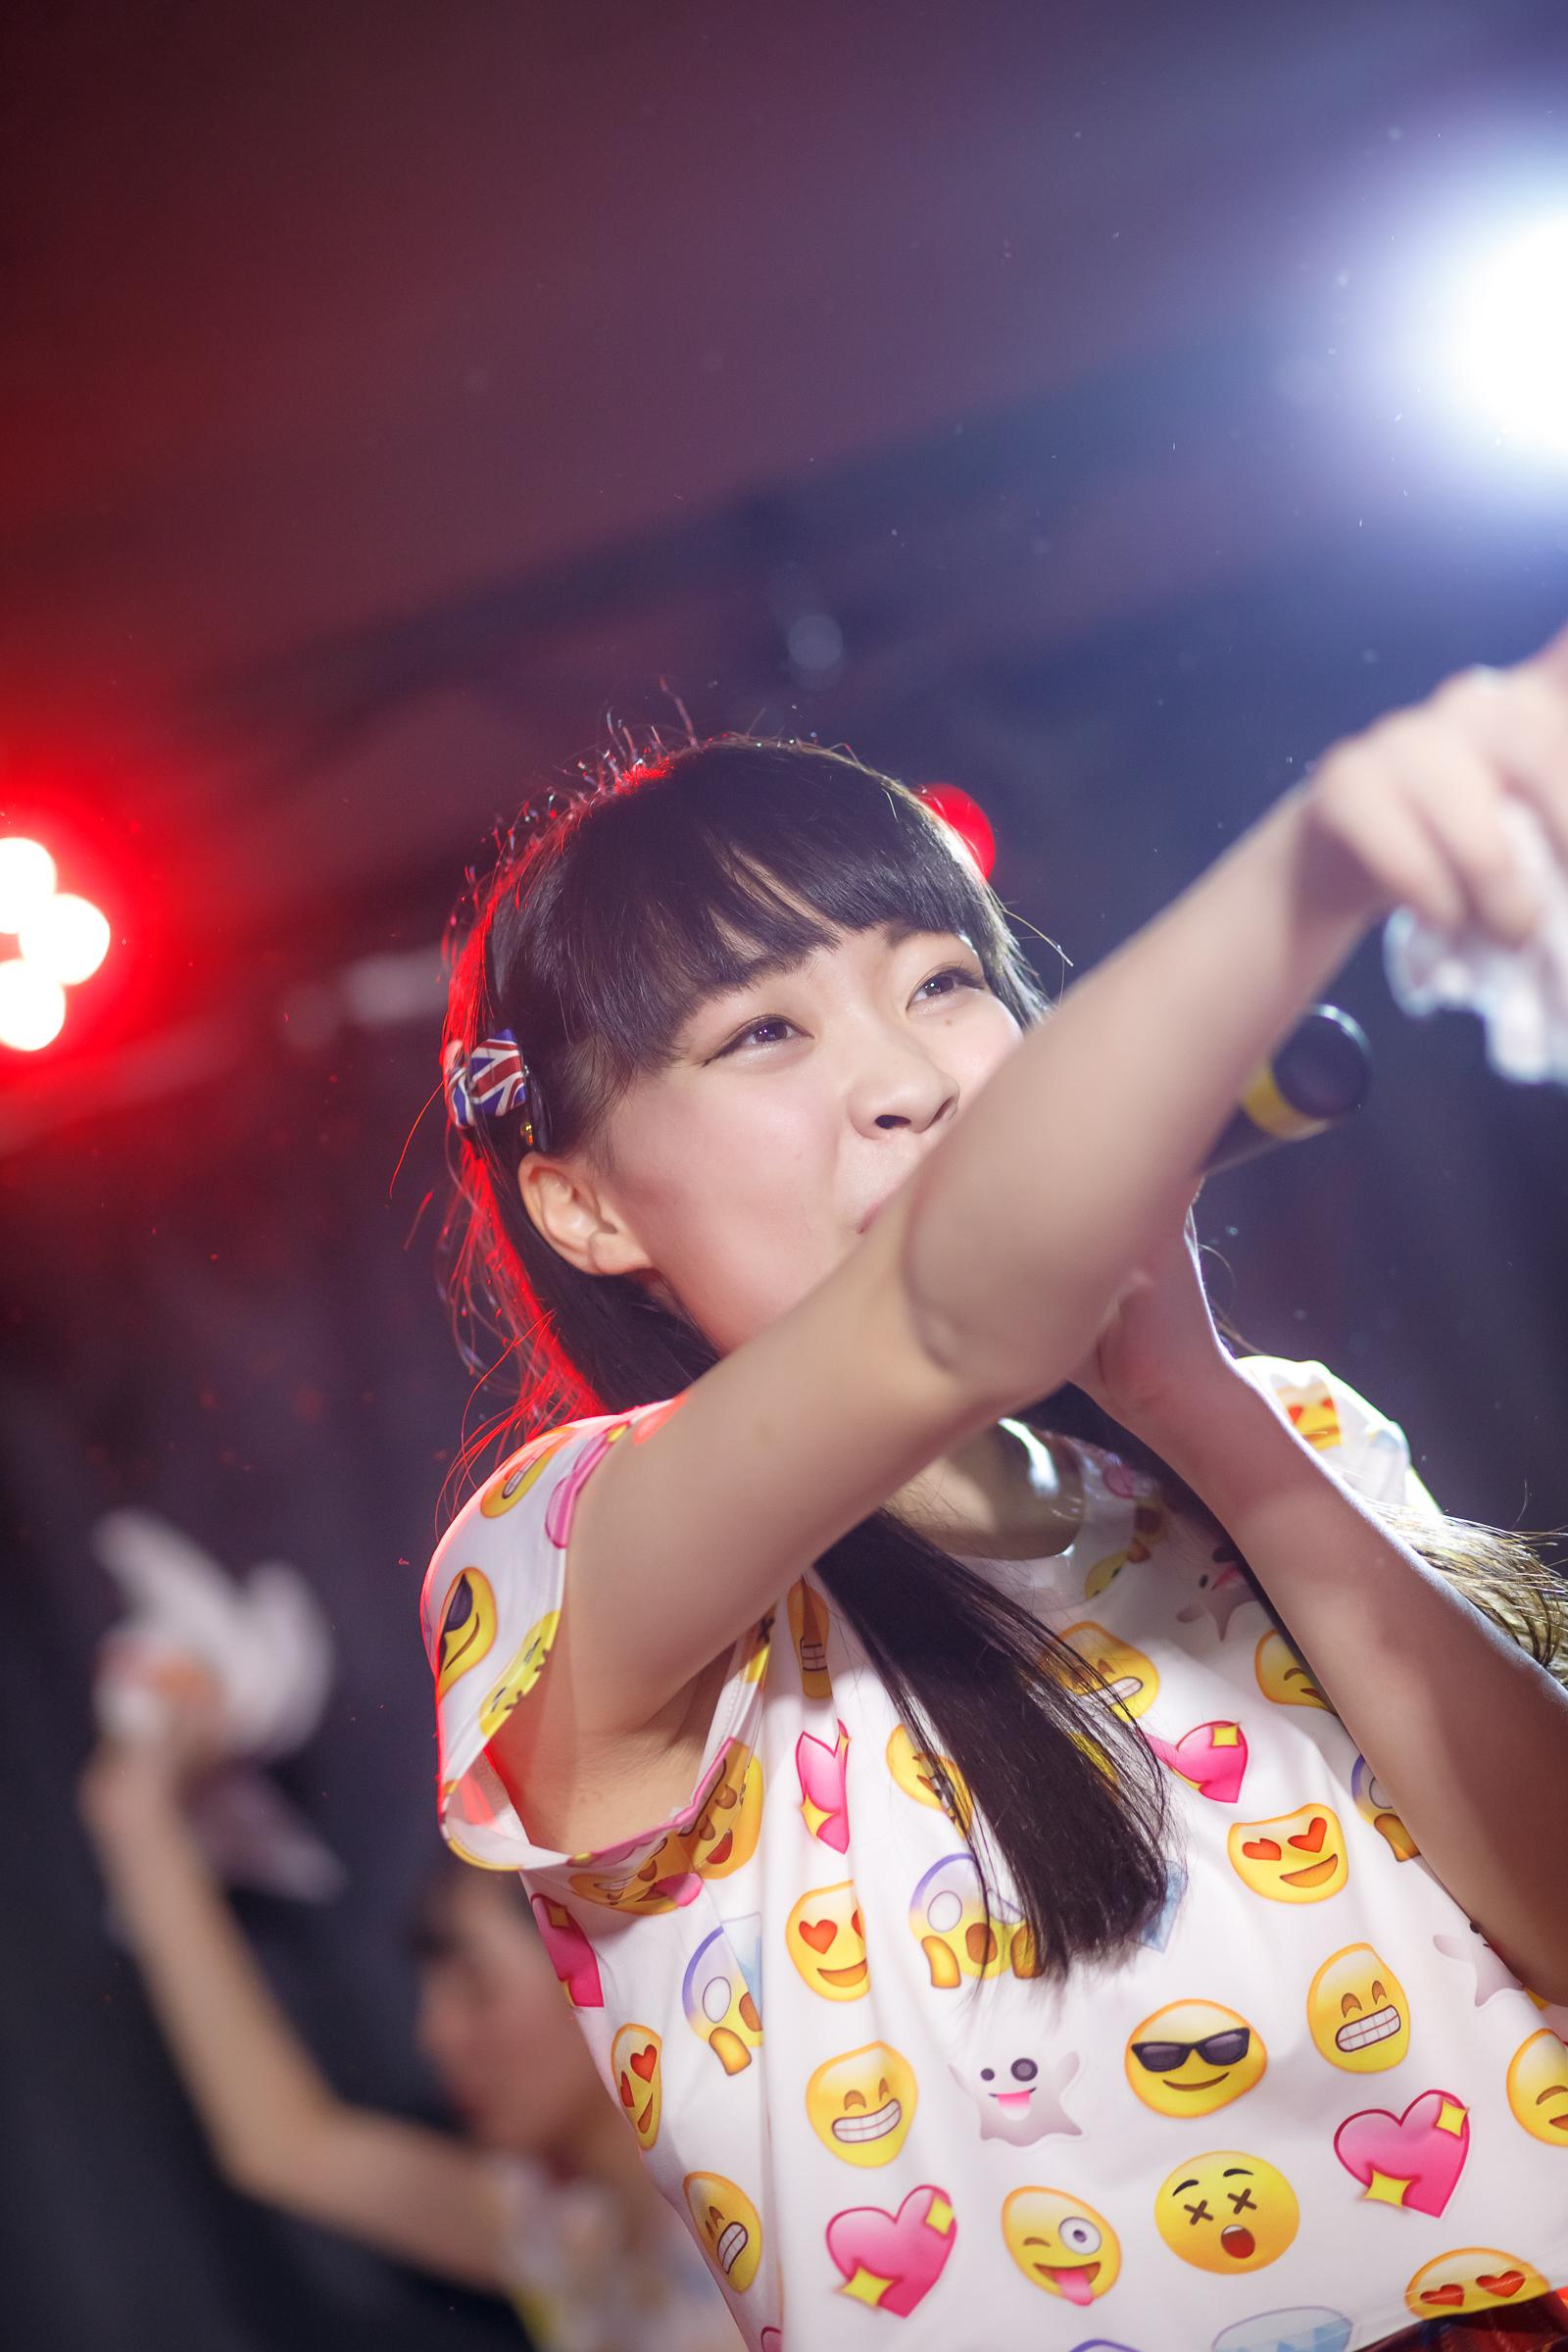 POPPING☆SMILE あゆり ( 福山愛由梨 )